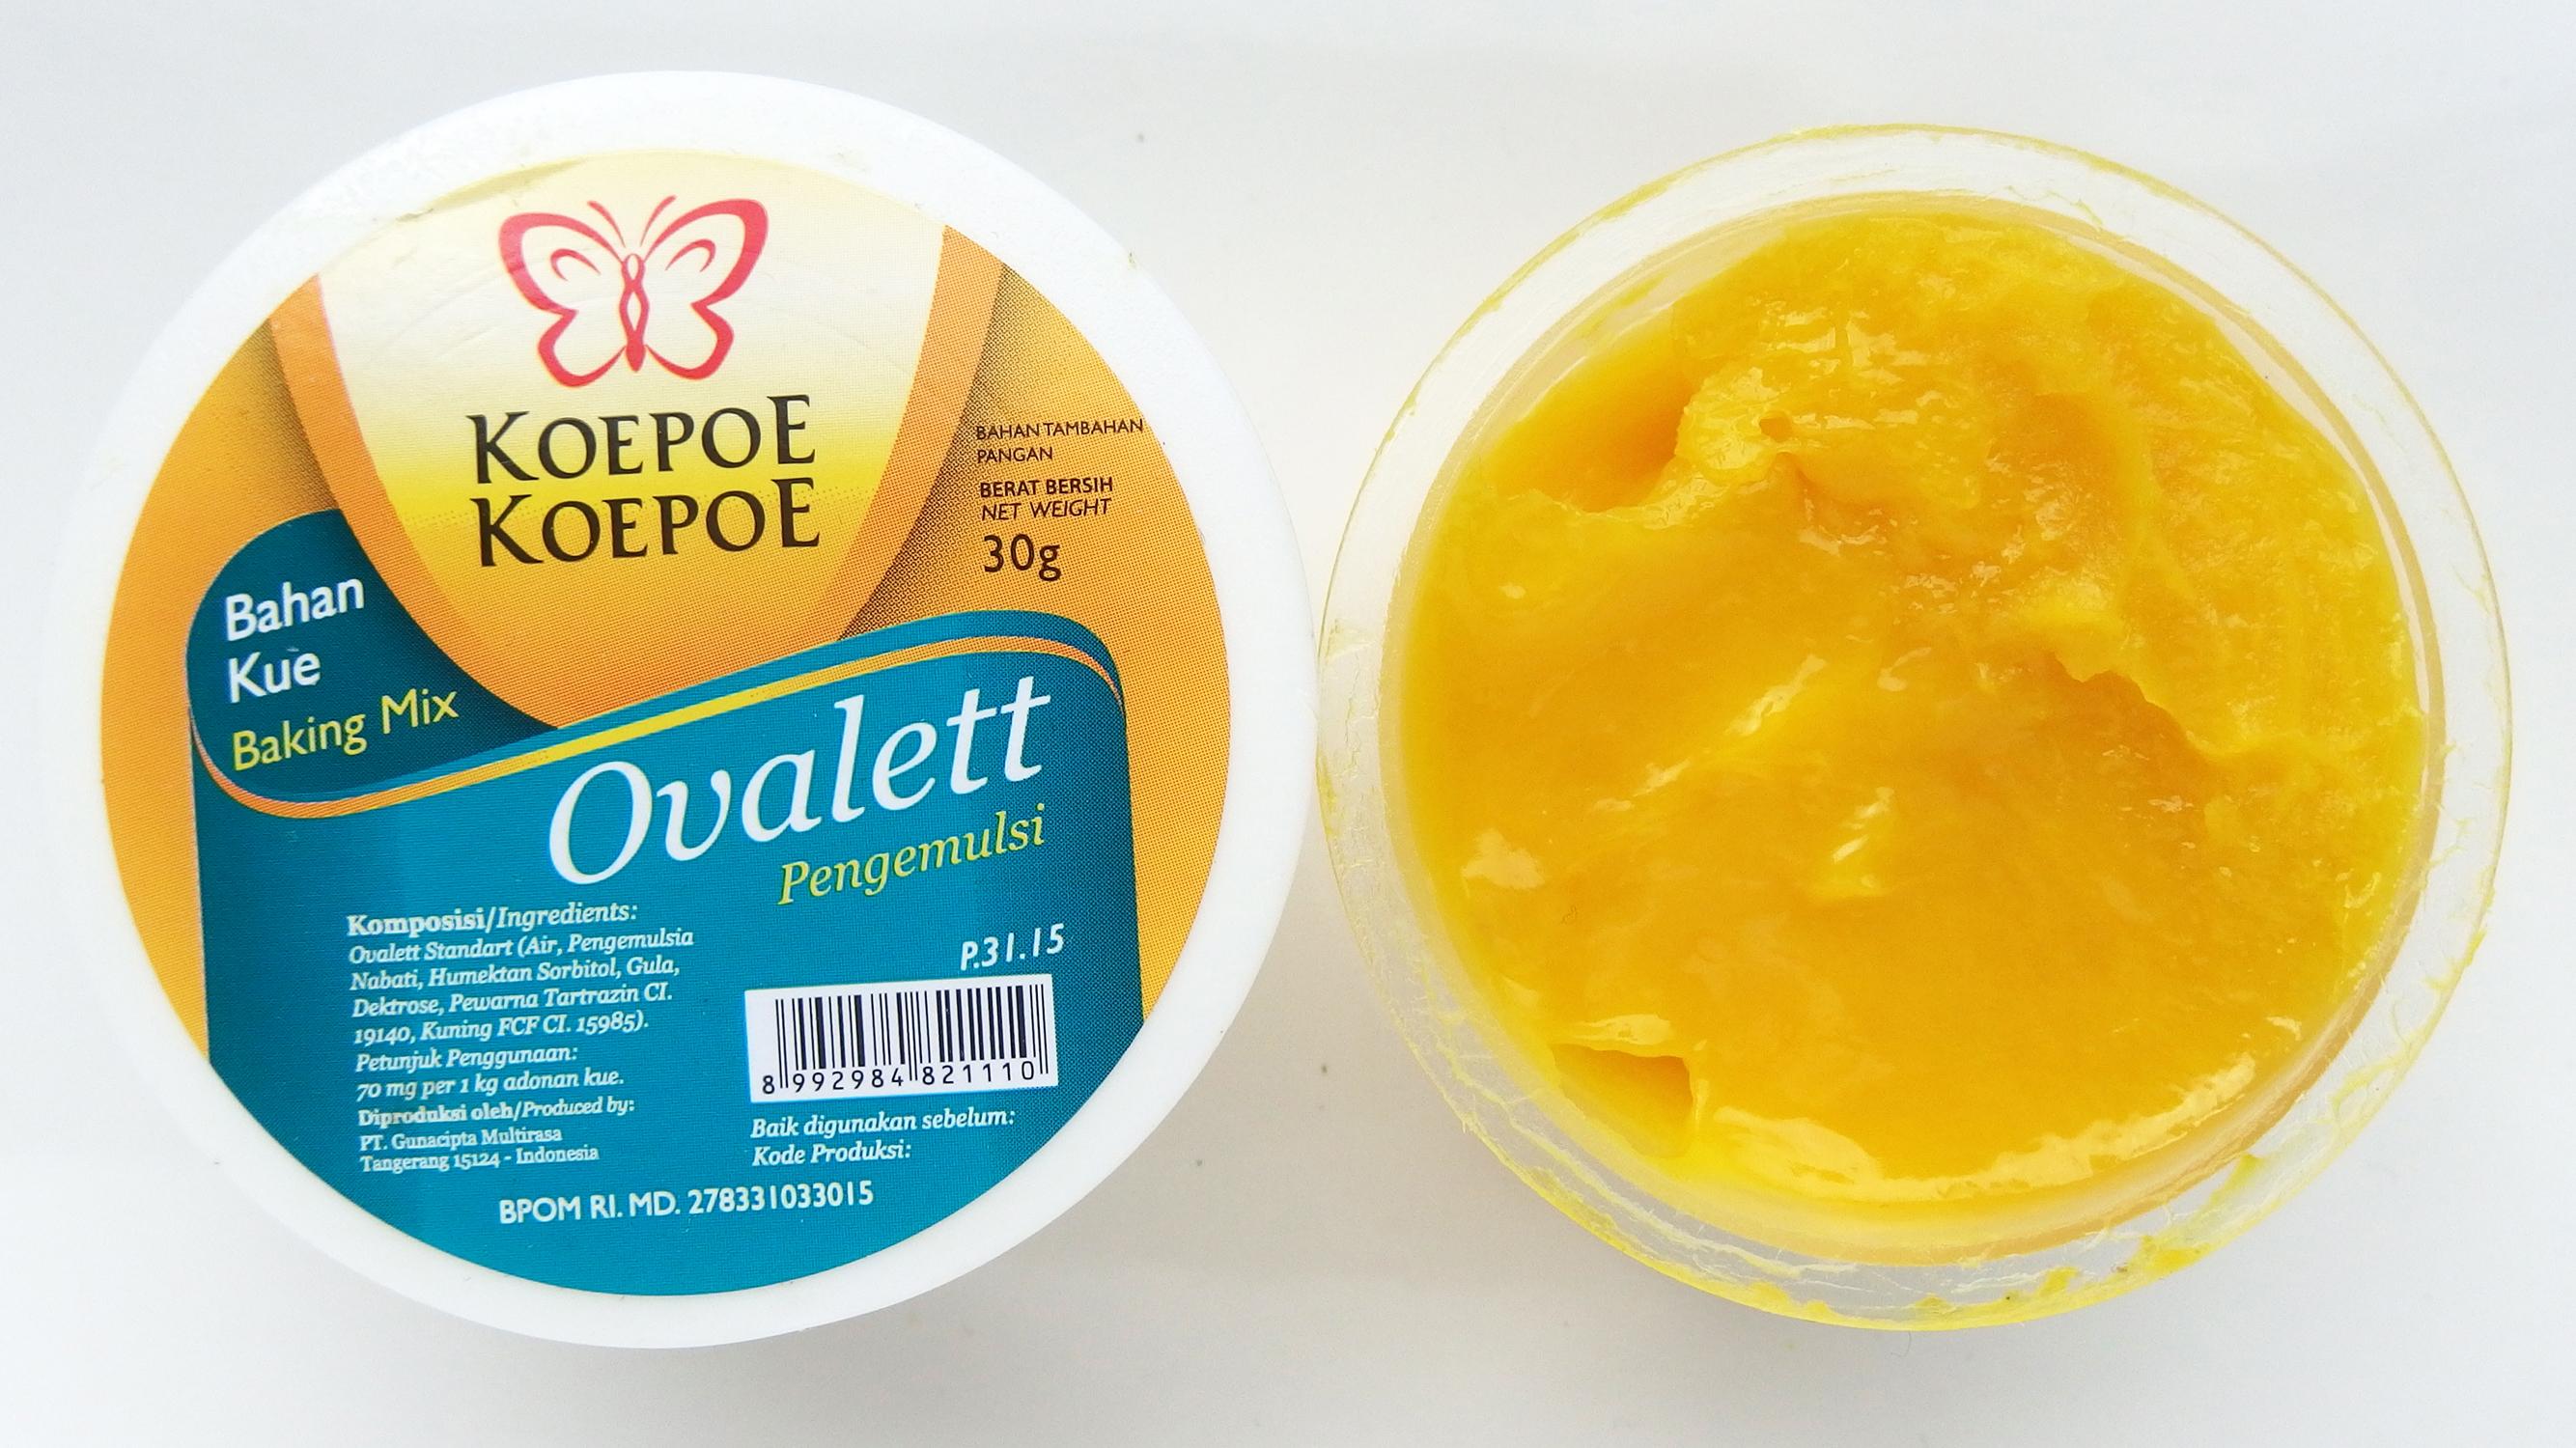 Ovalette (Ovalett, SP of TMB) | Aziatische-ingrediënten.nl